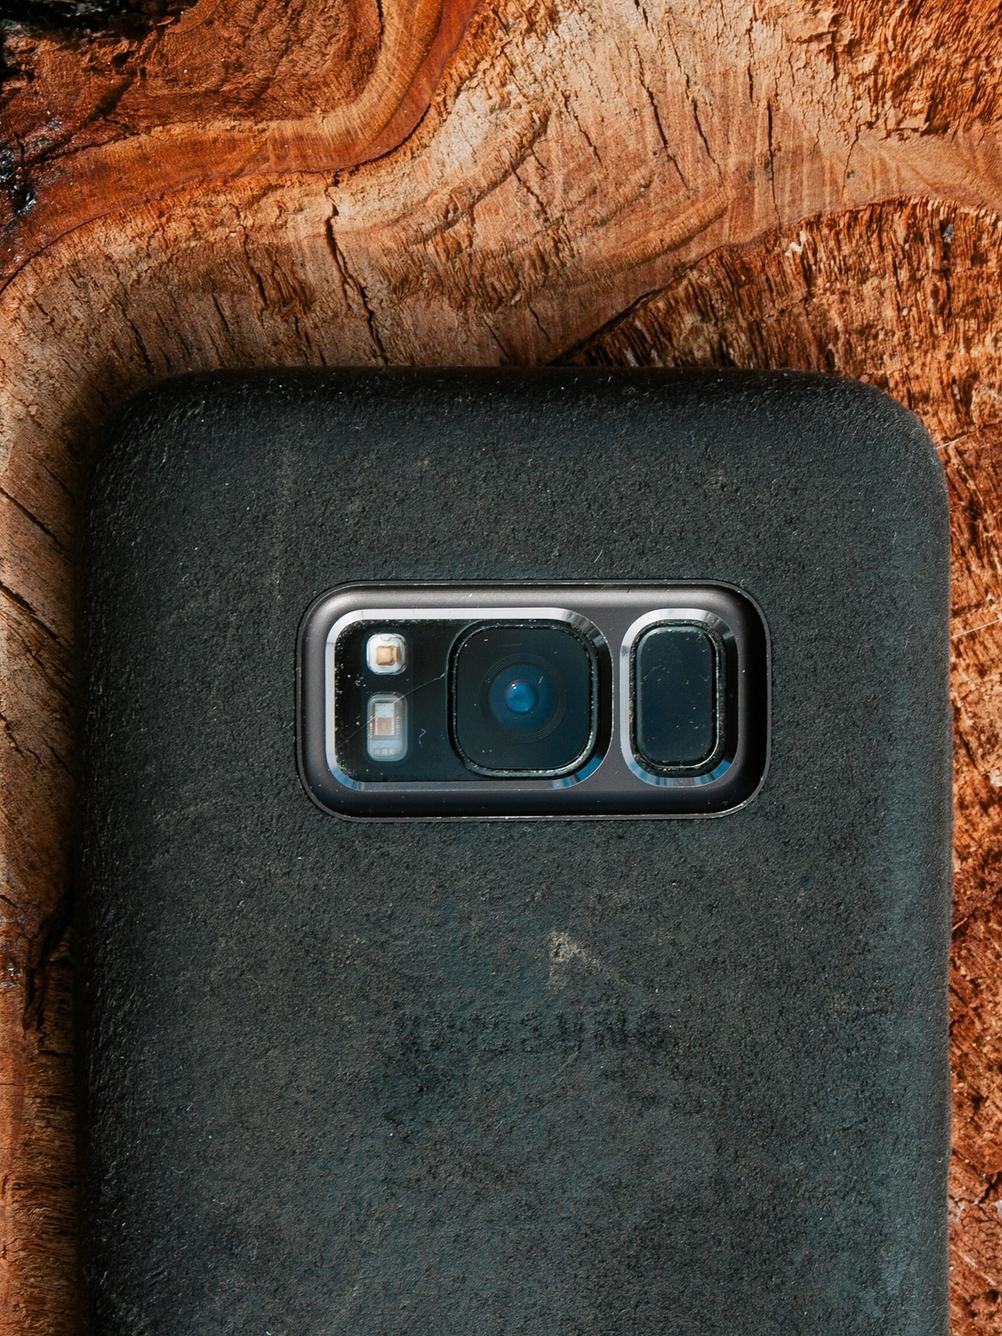 Photo of Samsung S8 rear camera.